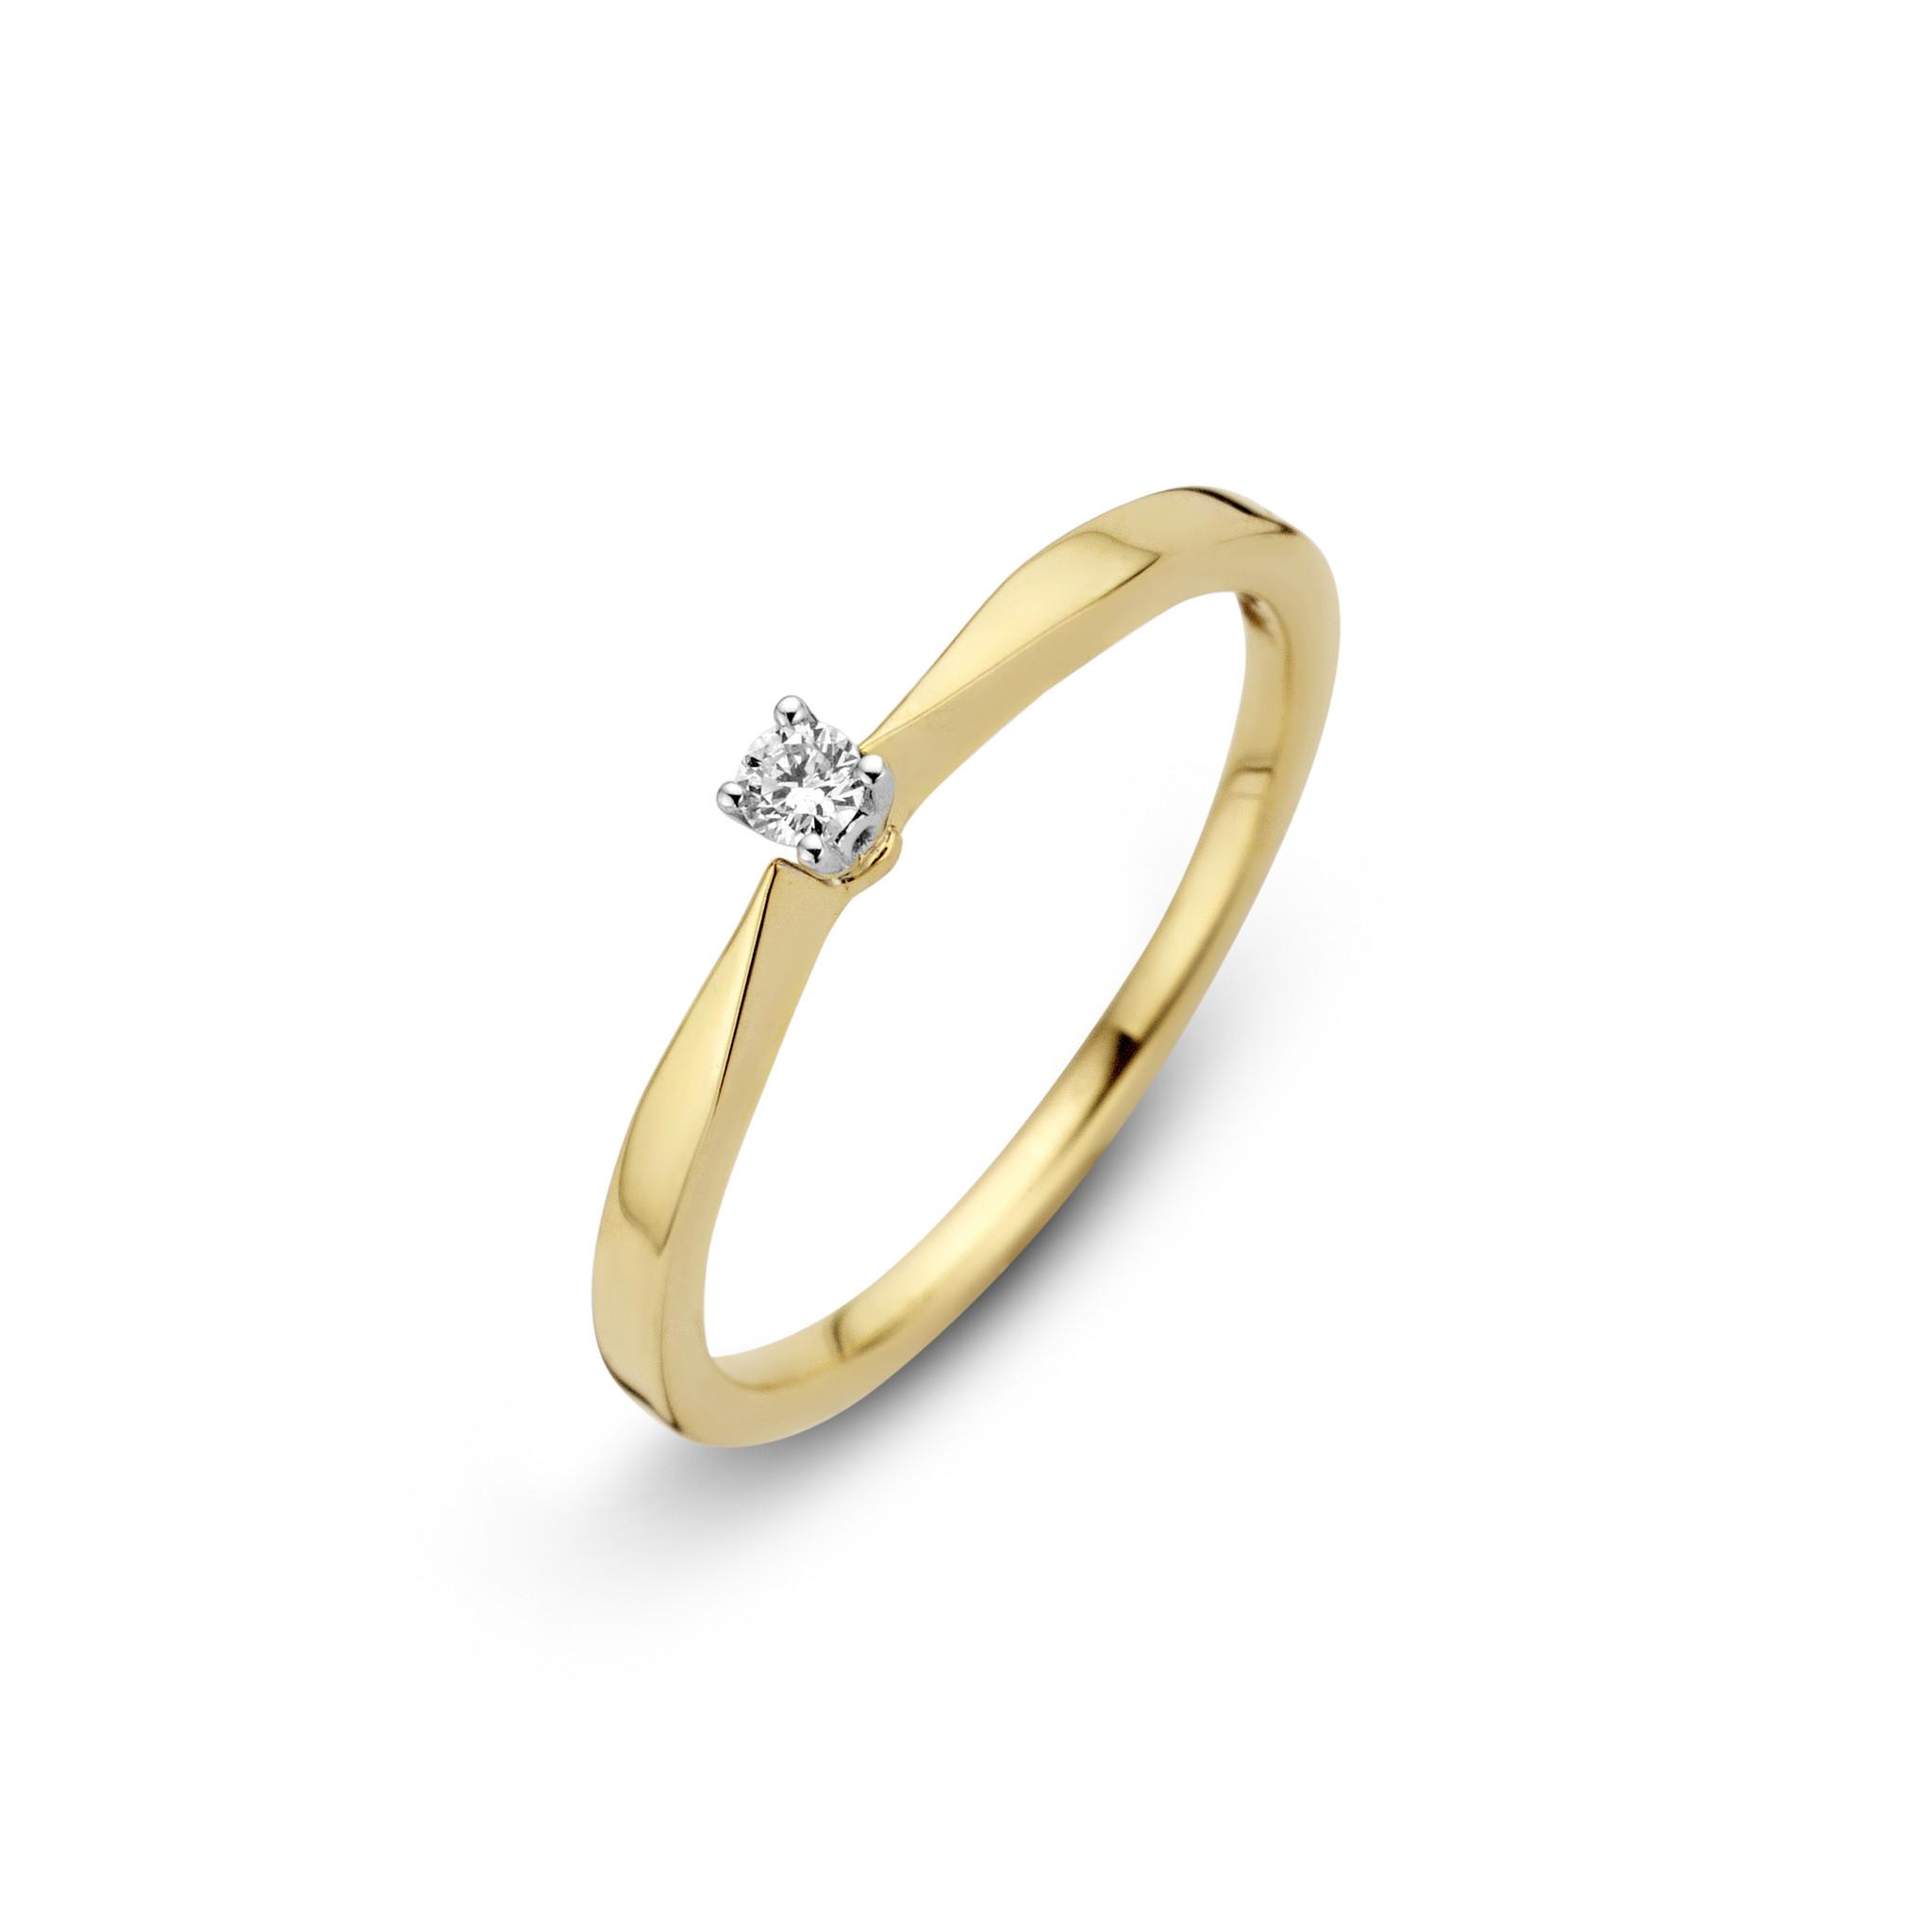 Private Label CvdK 14kt geelgouden ring met briljant, 0,05ct